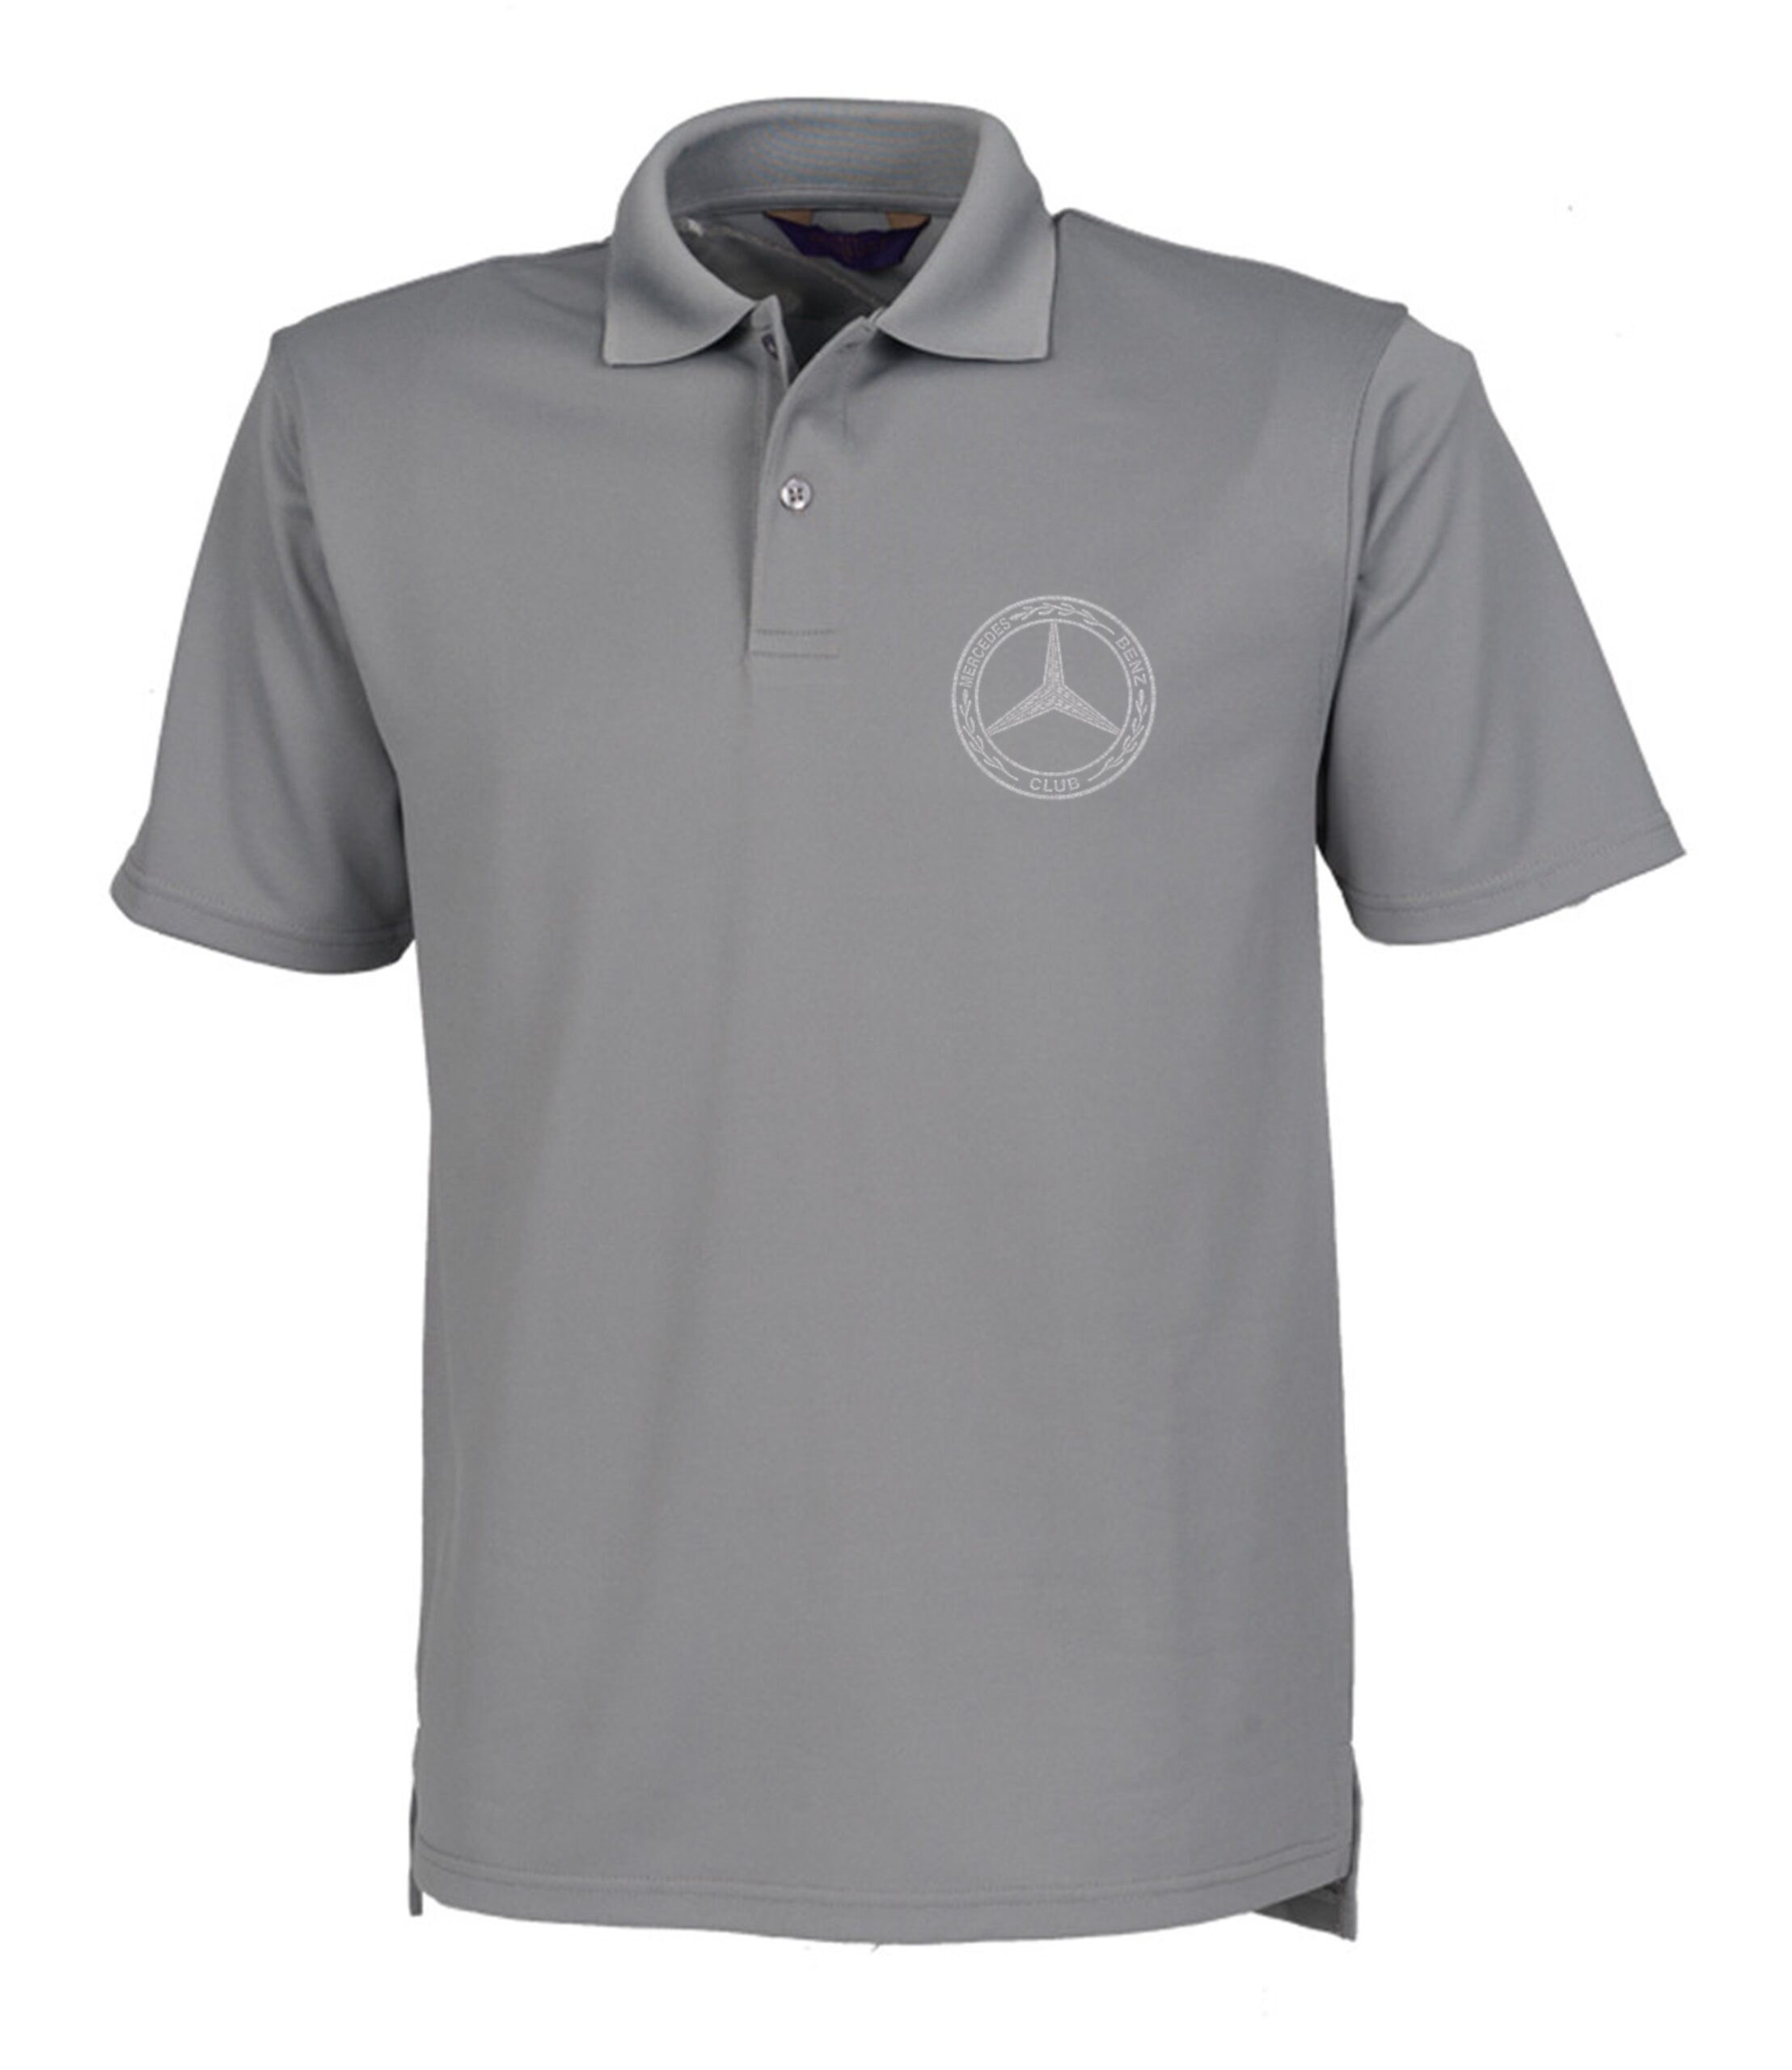 Mercedes-Benz Club Wicking Pique Polo Shirt Charcoal